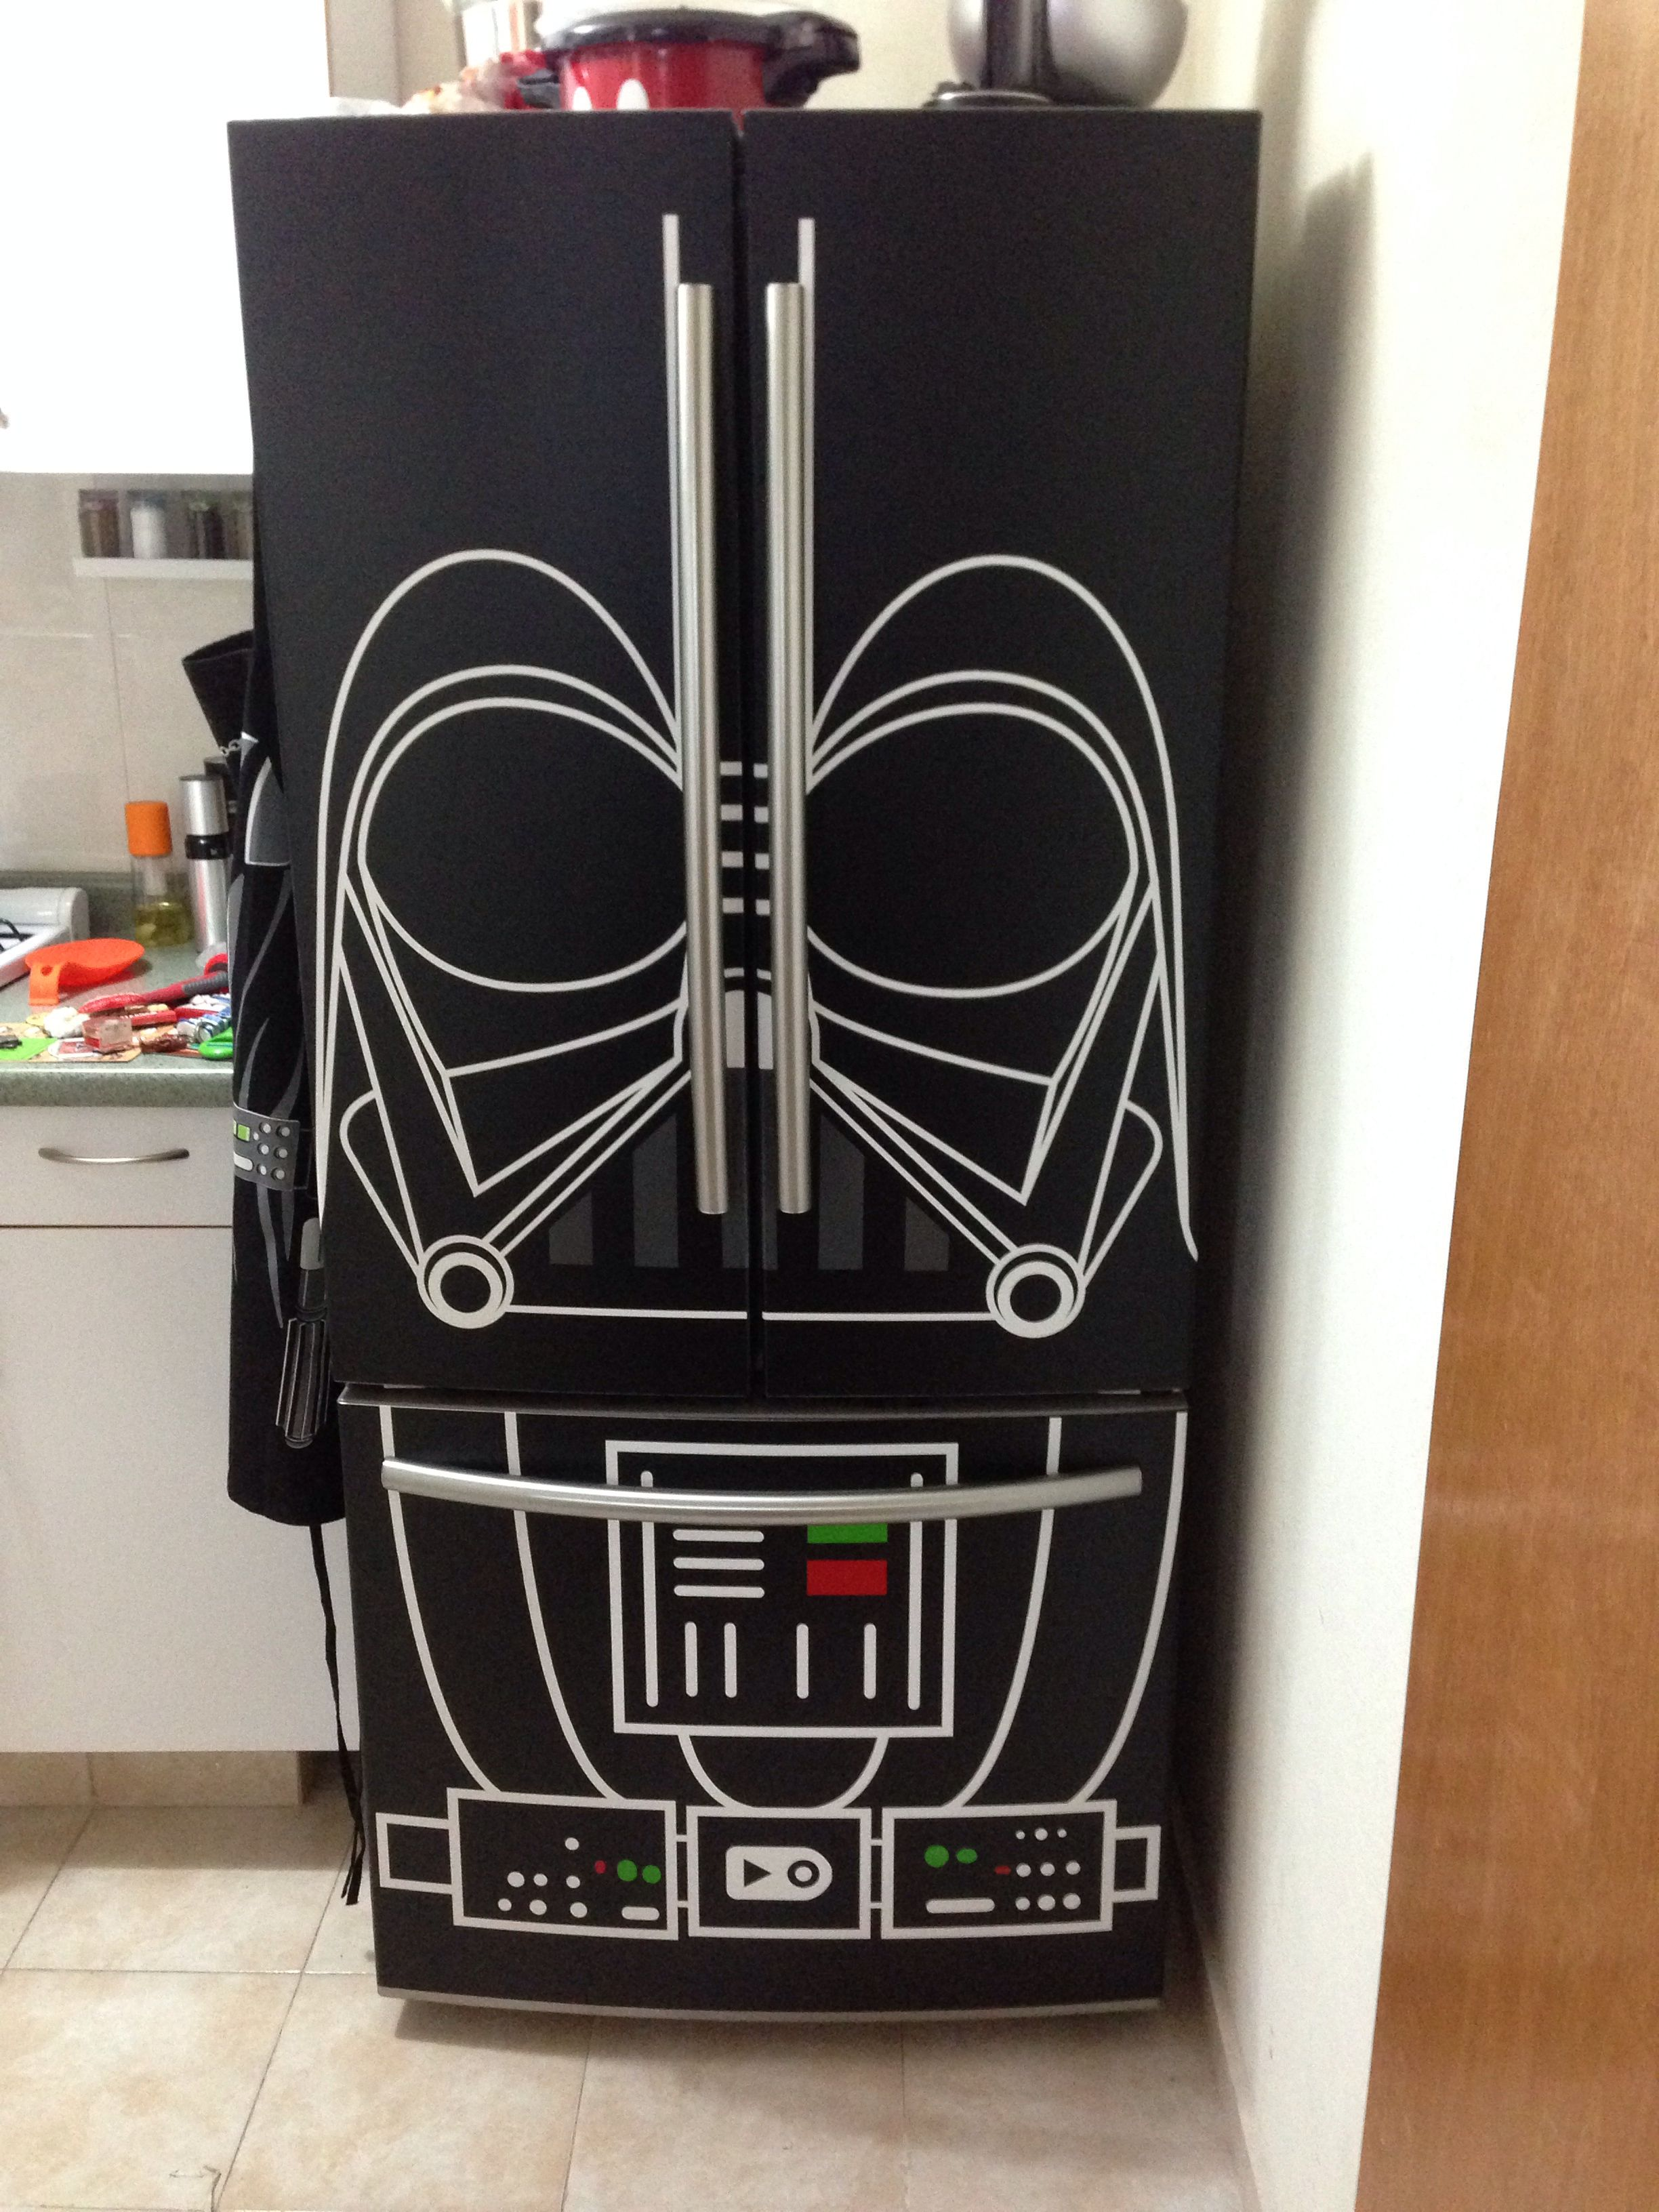 Vinil De Darth Vader Para Refrigerator Vinilos Y Viniles